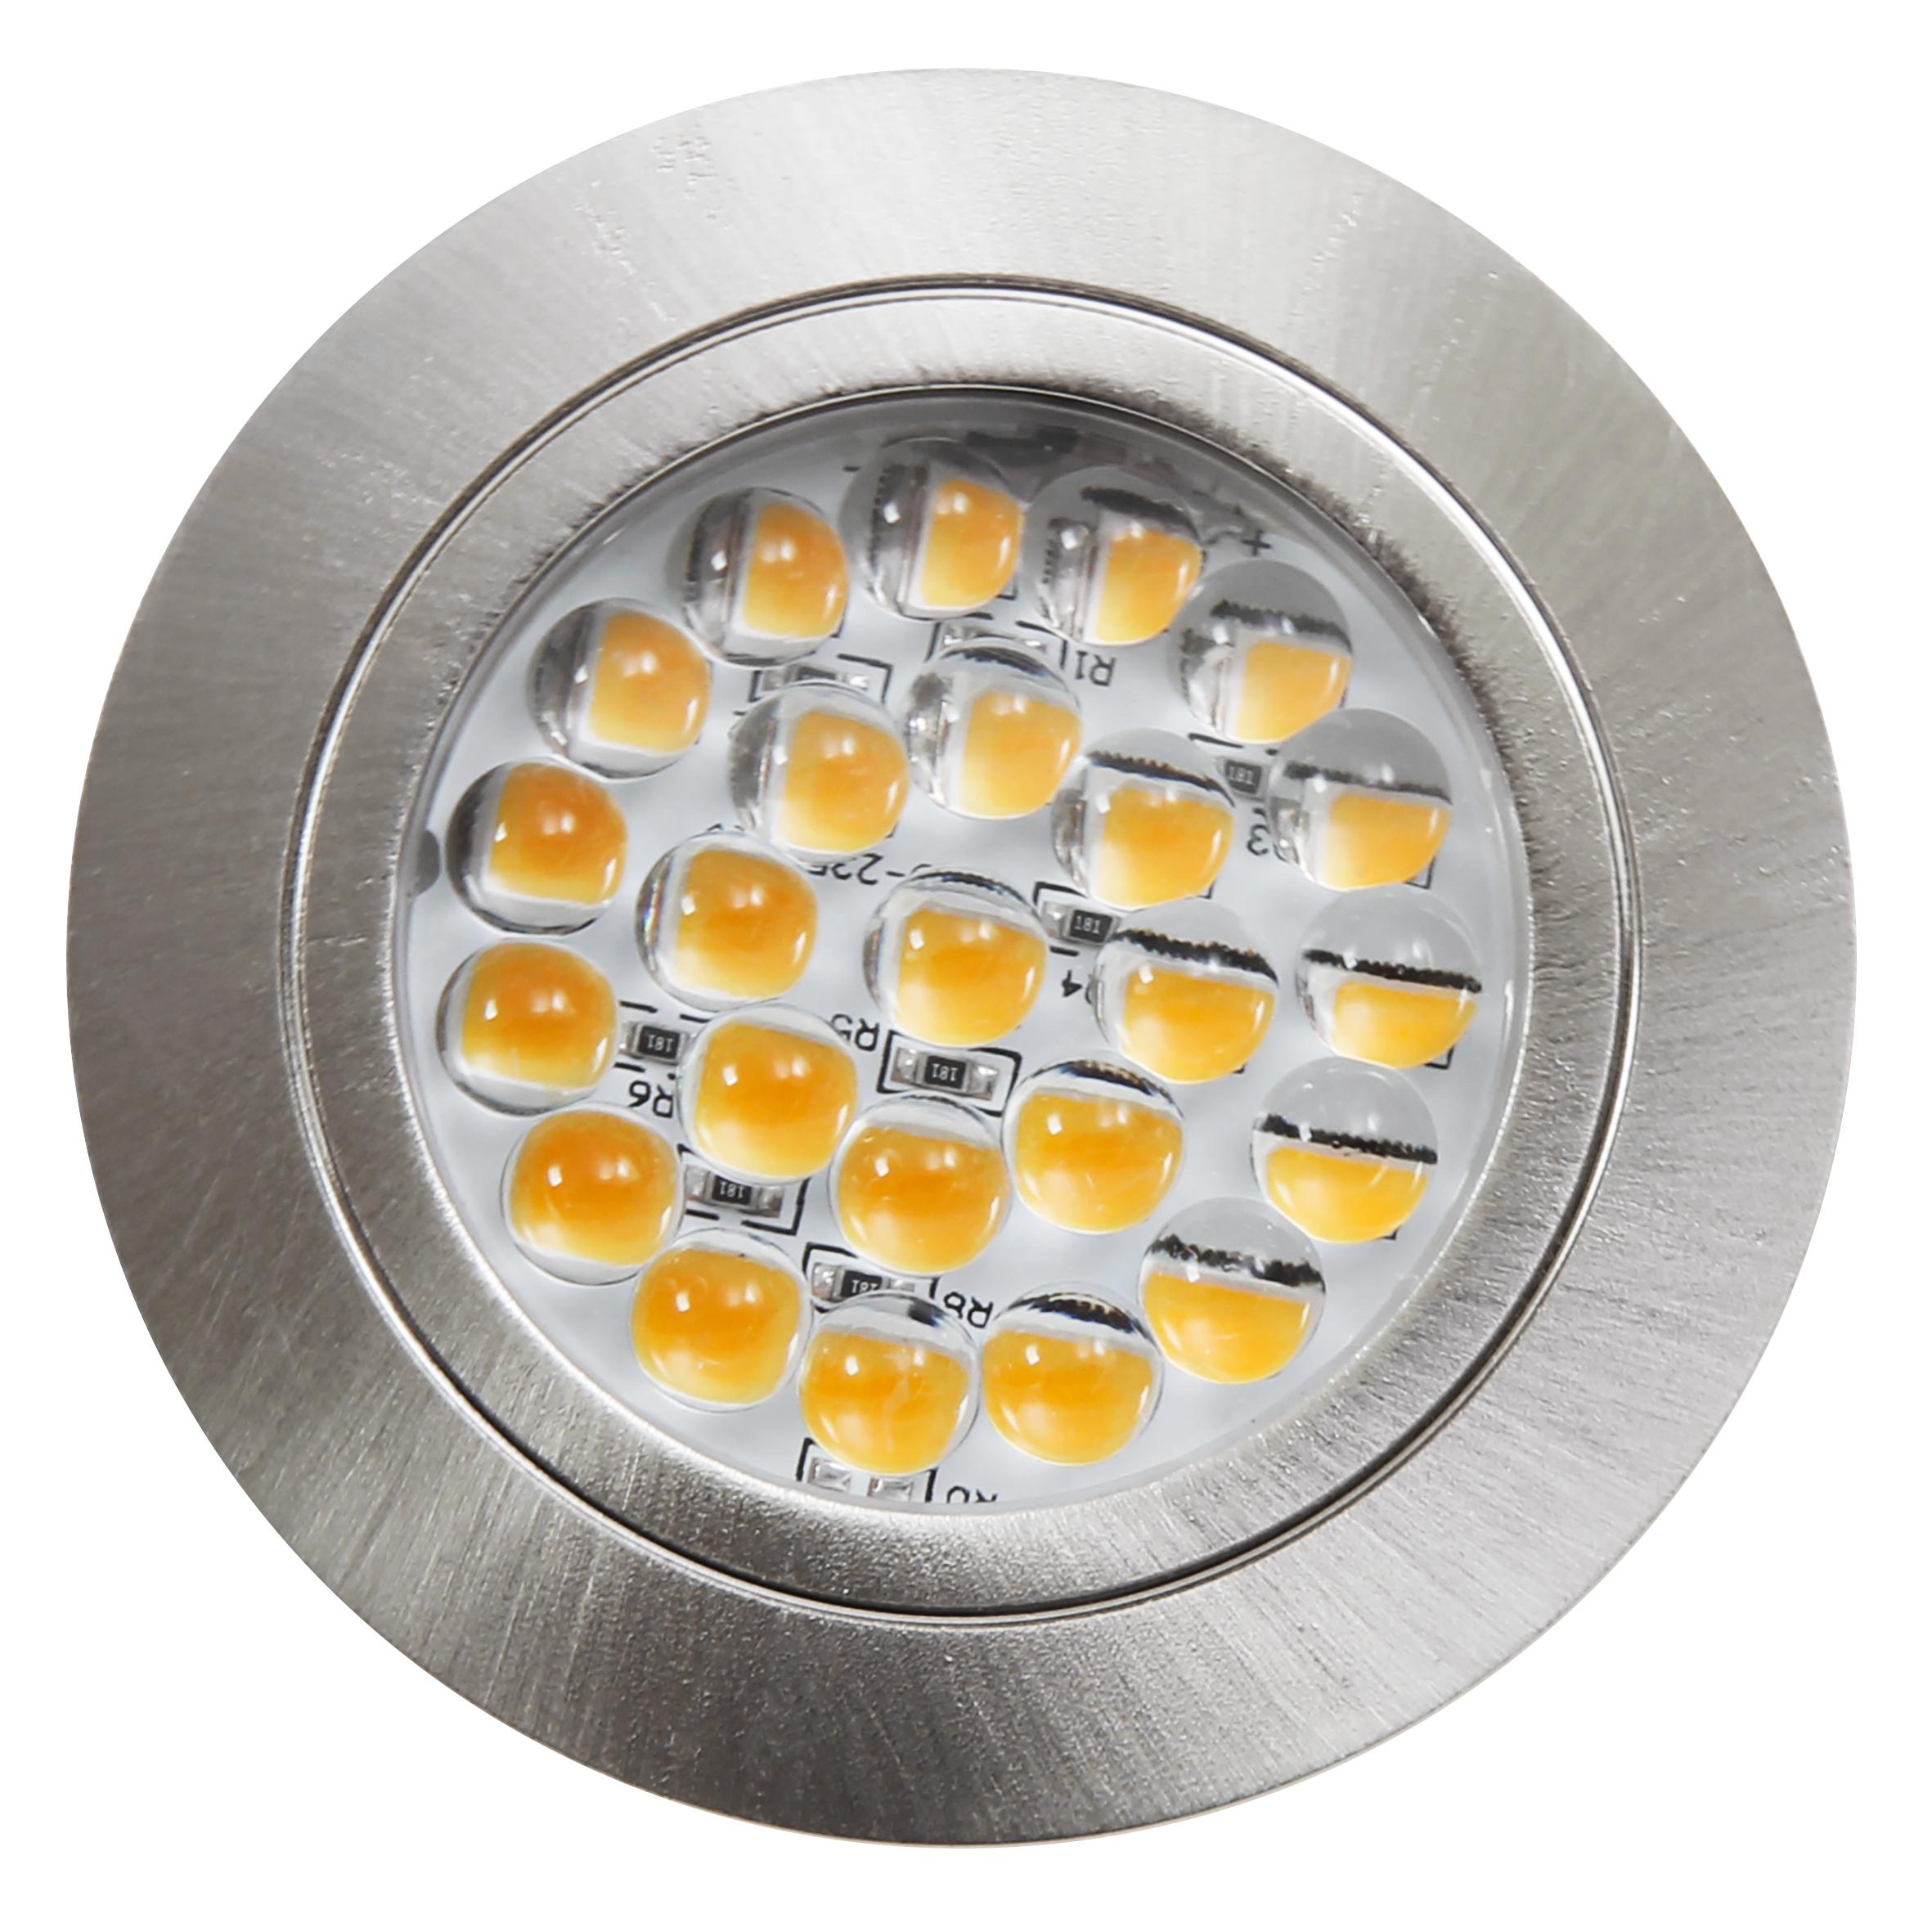 LED-Möbelleuchte McShine ''LM-24'' 2,4W, 190lm Ø65,5x10,7mm, neutralweiß